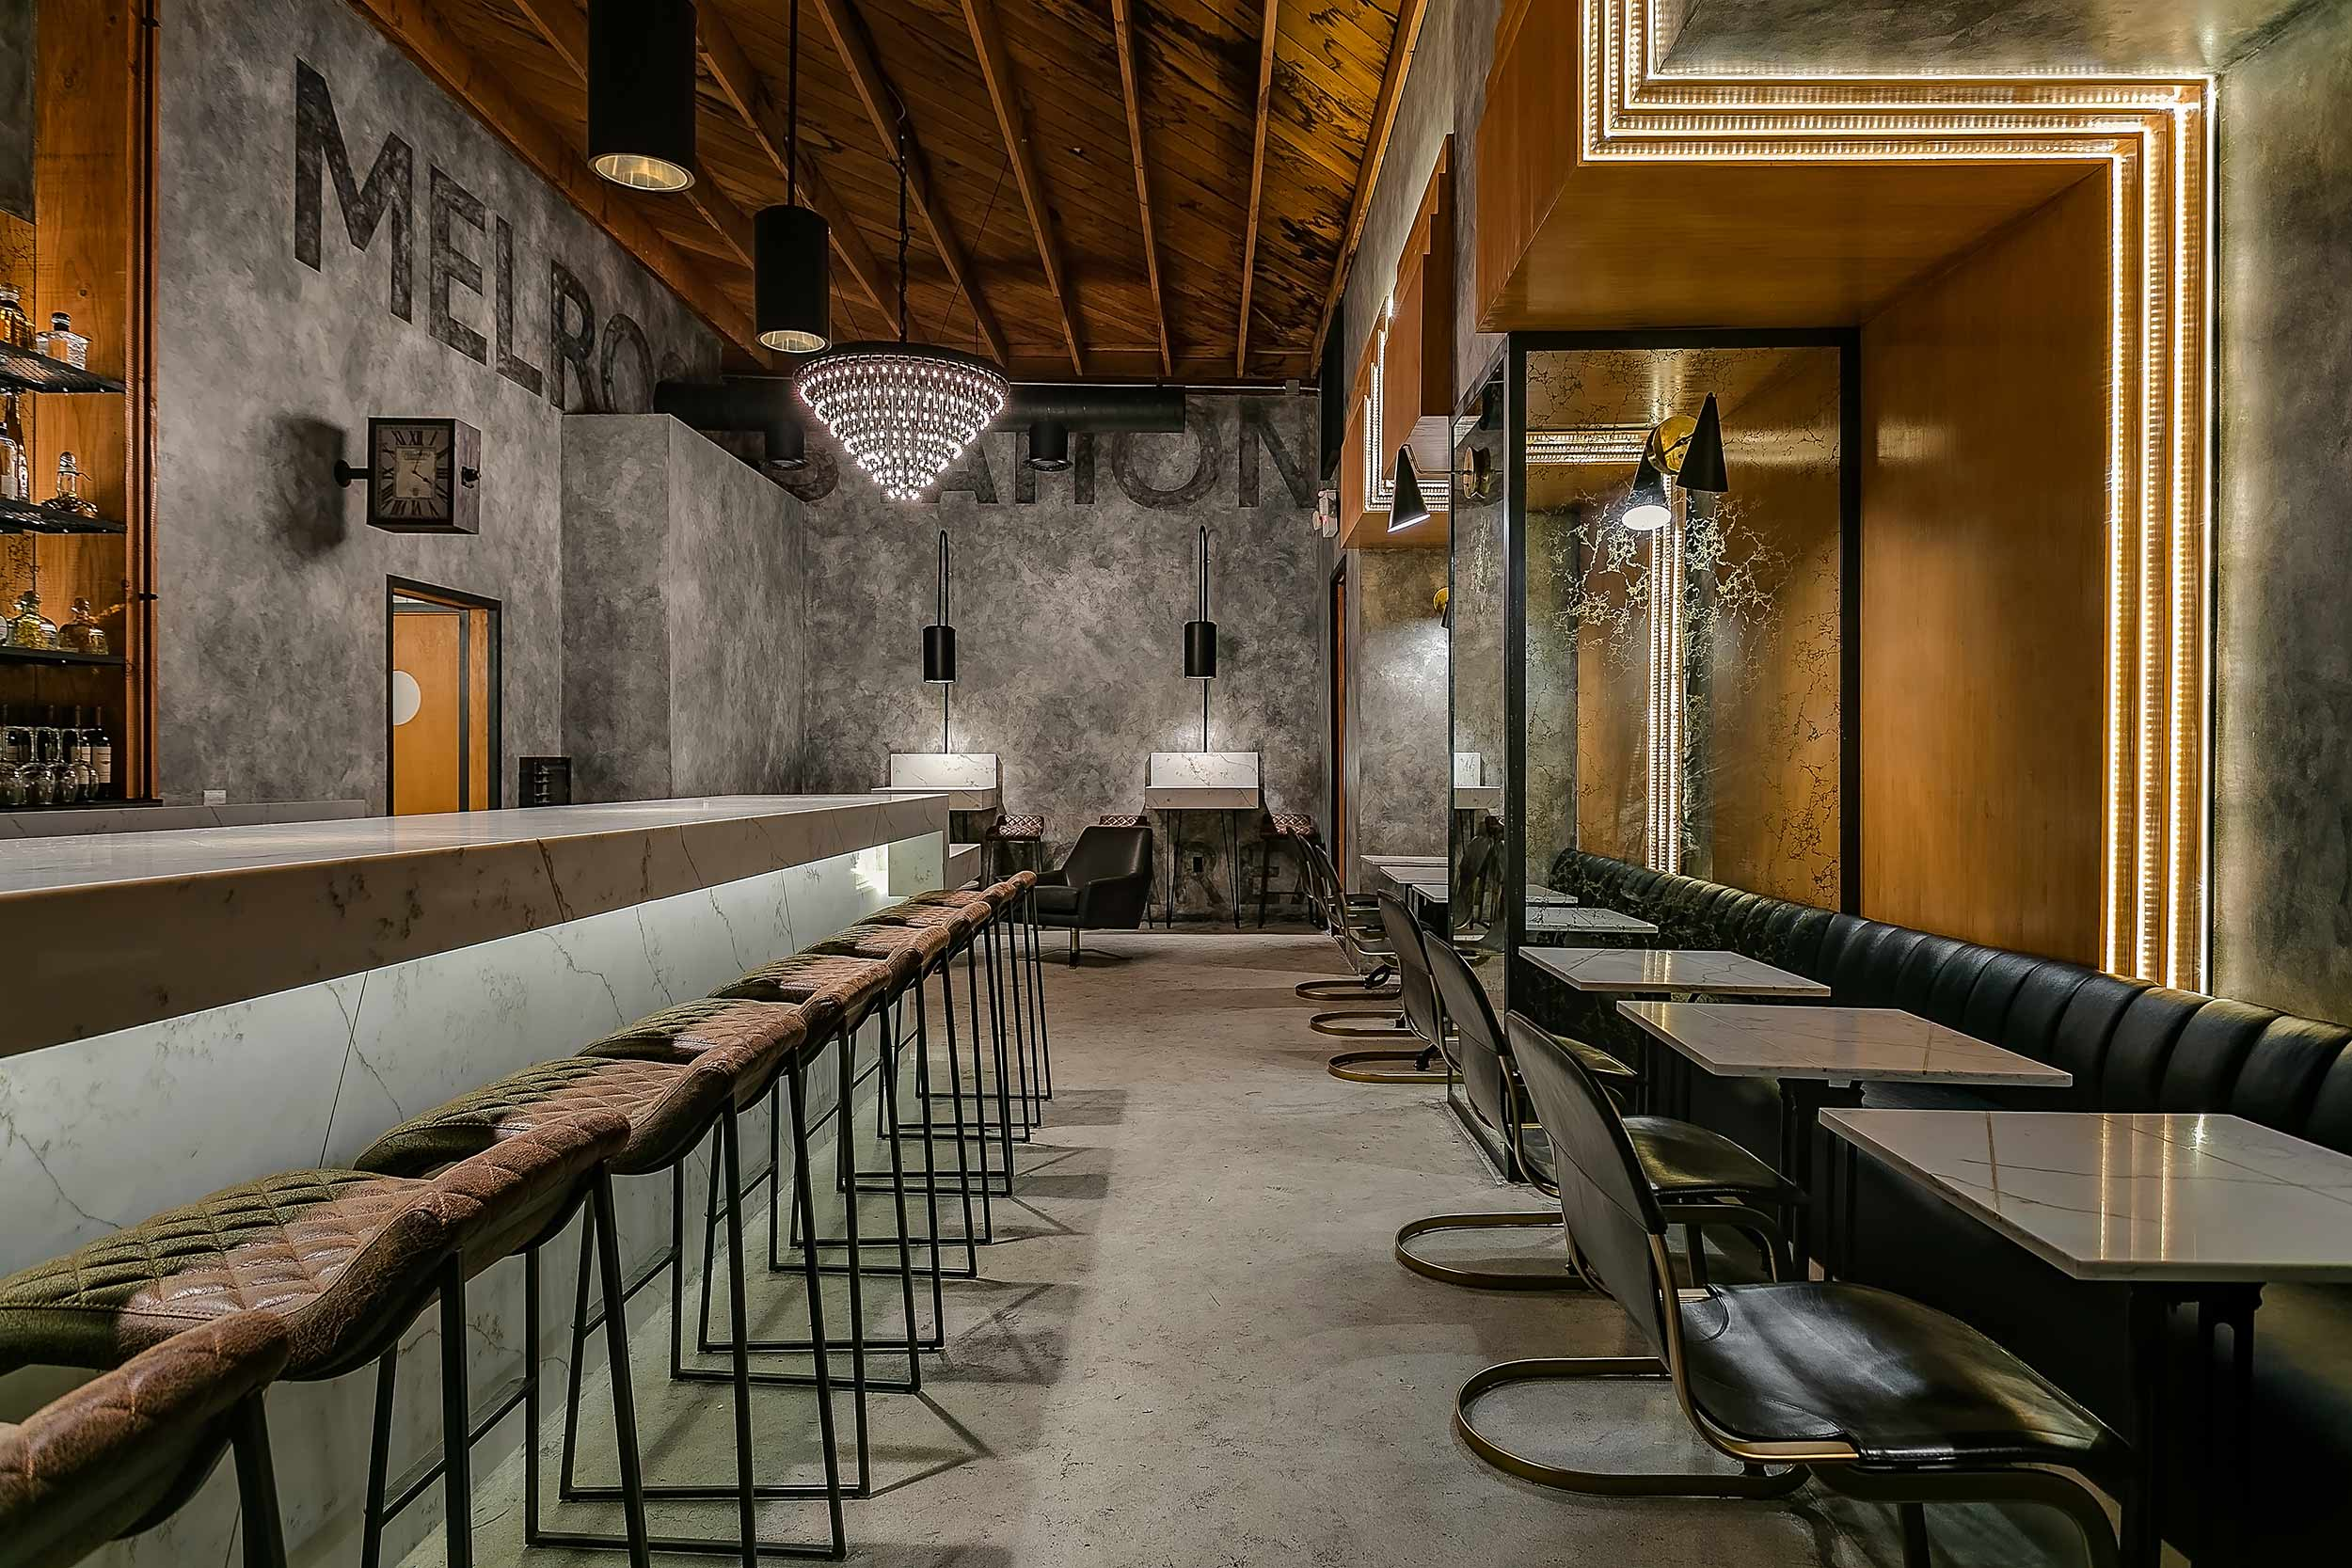 archillusion-design-melrose-station-restaurant-bar-4.jpg